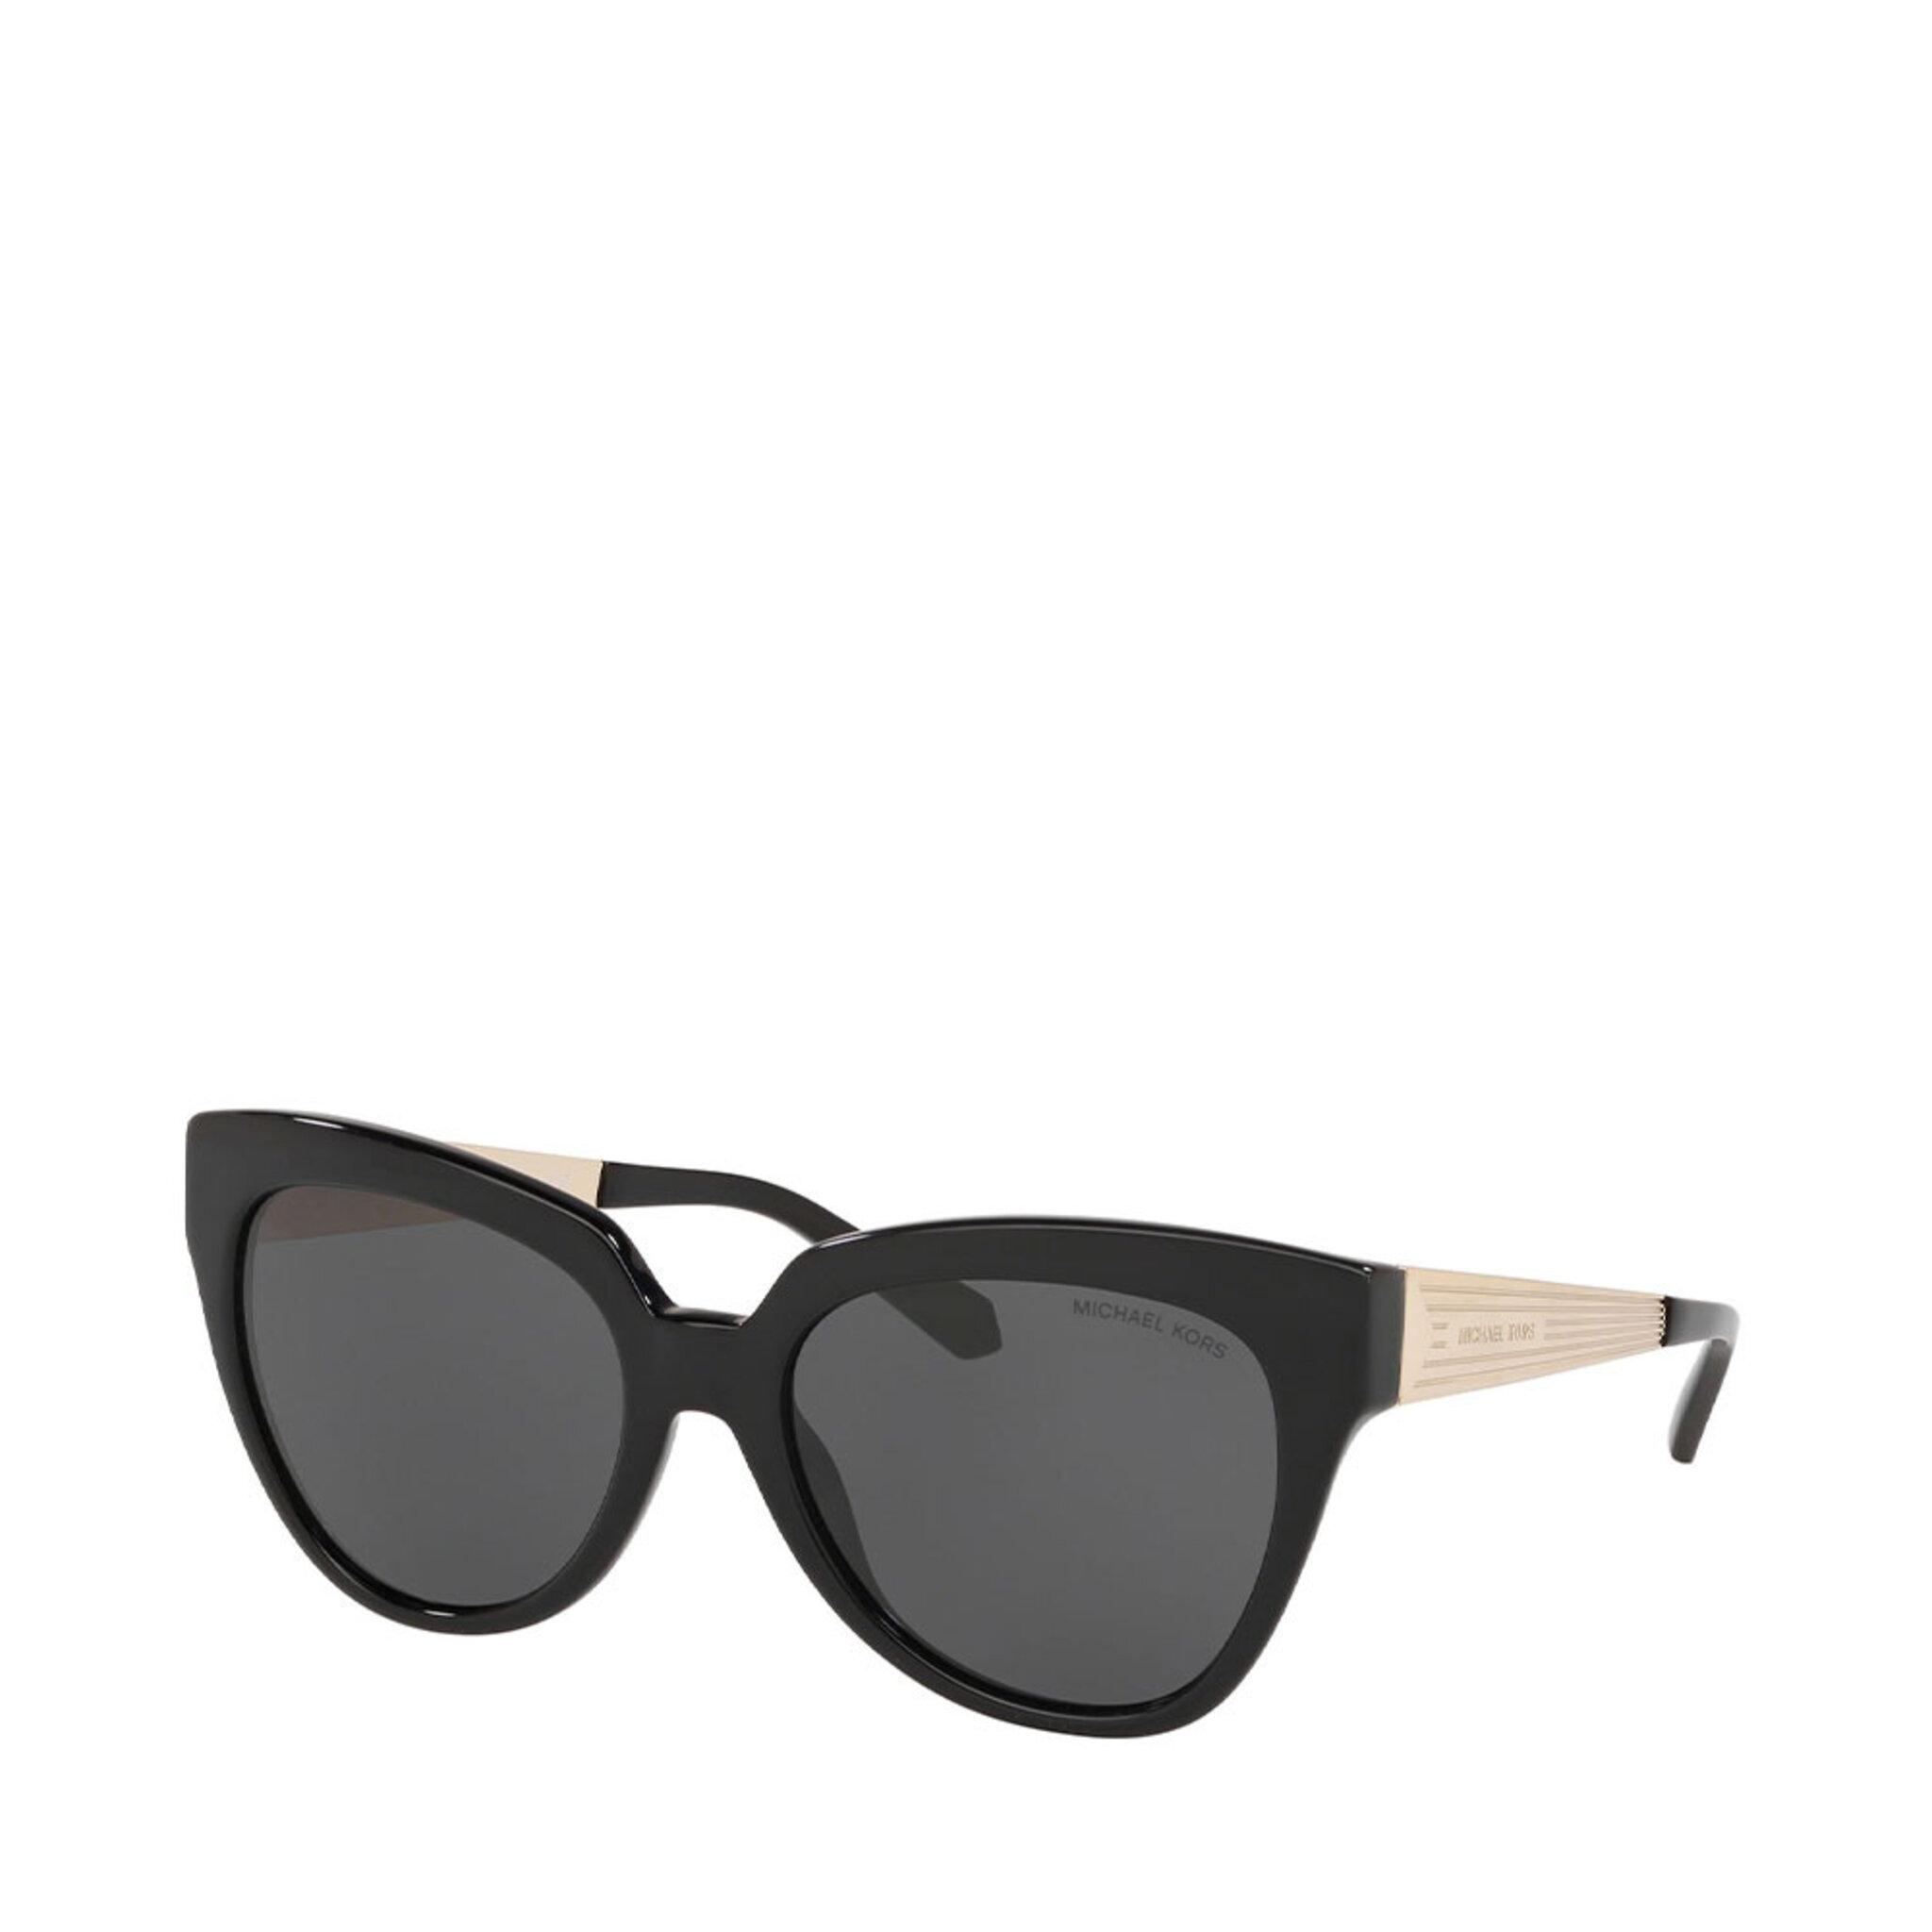 Solglasögon, Paloma I